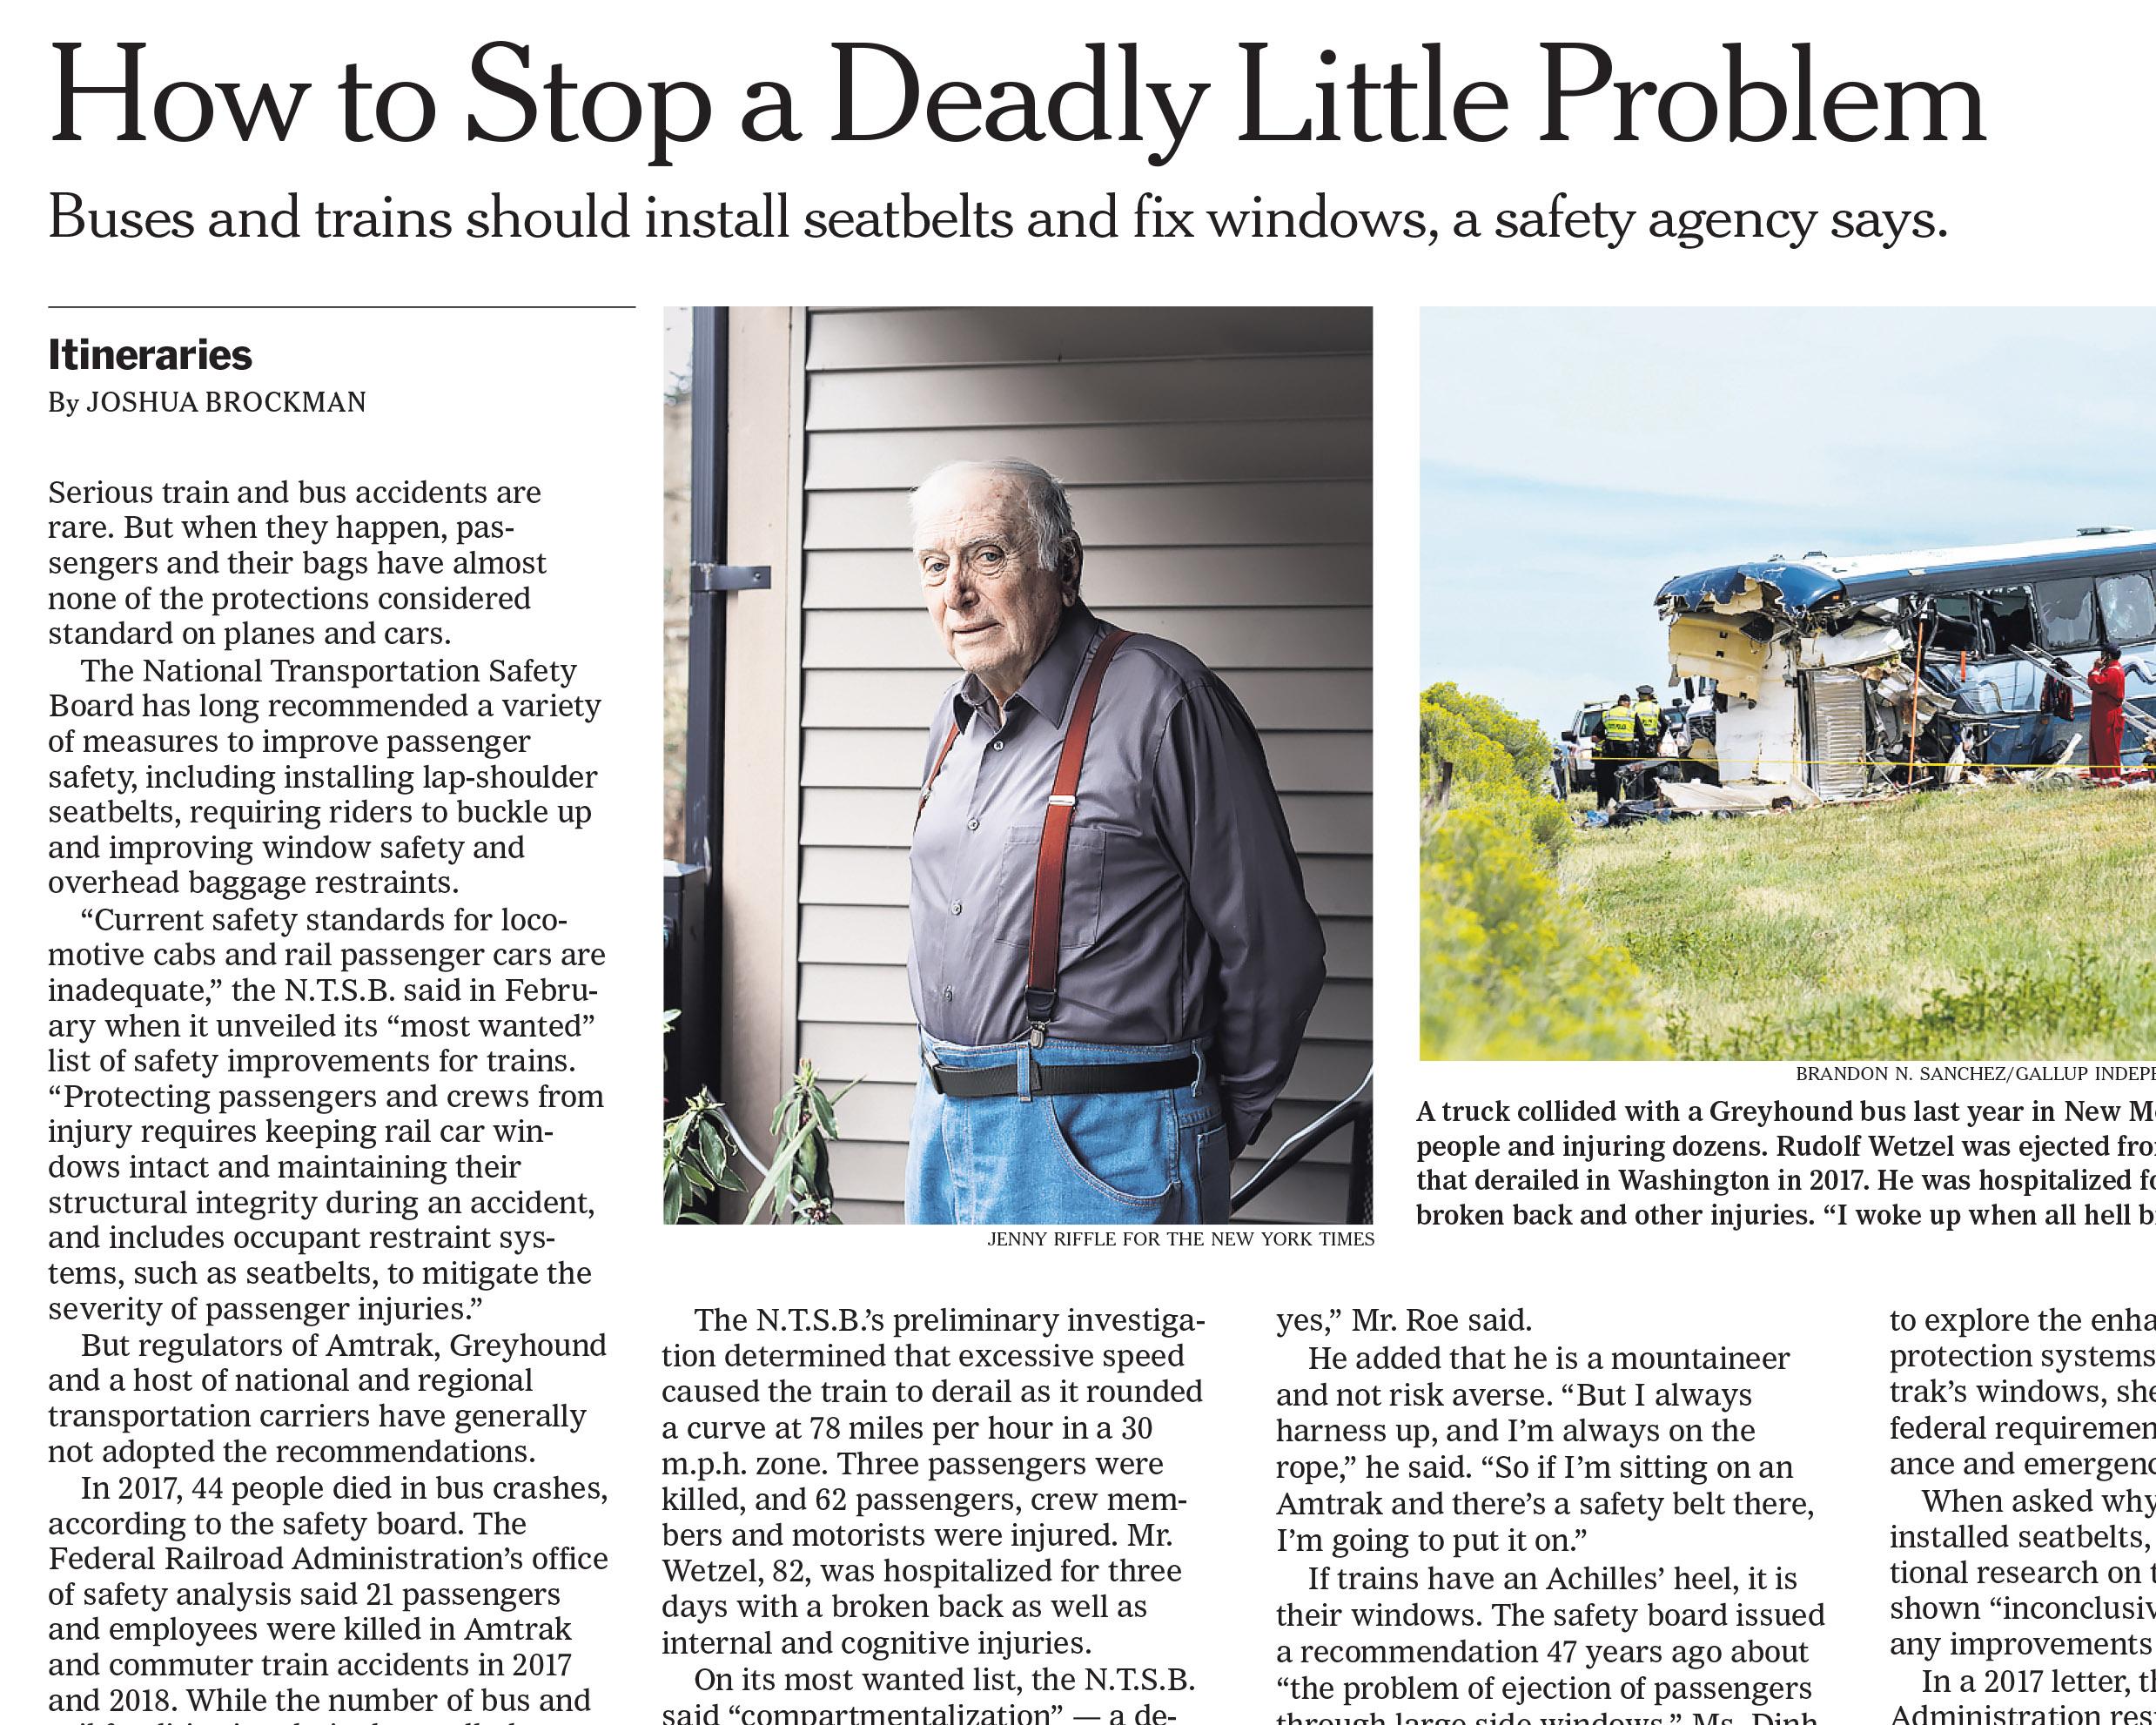 Rudolf Wetzel for The New York Times, April 9, 2019